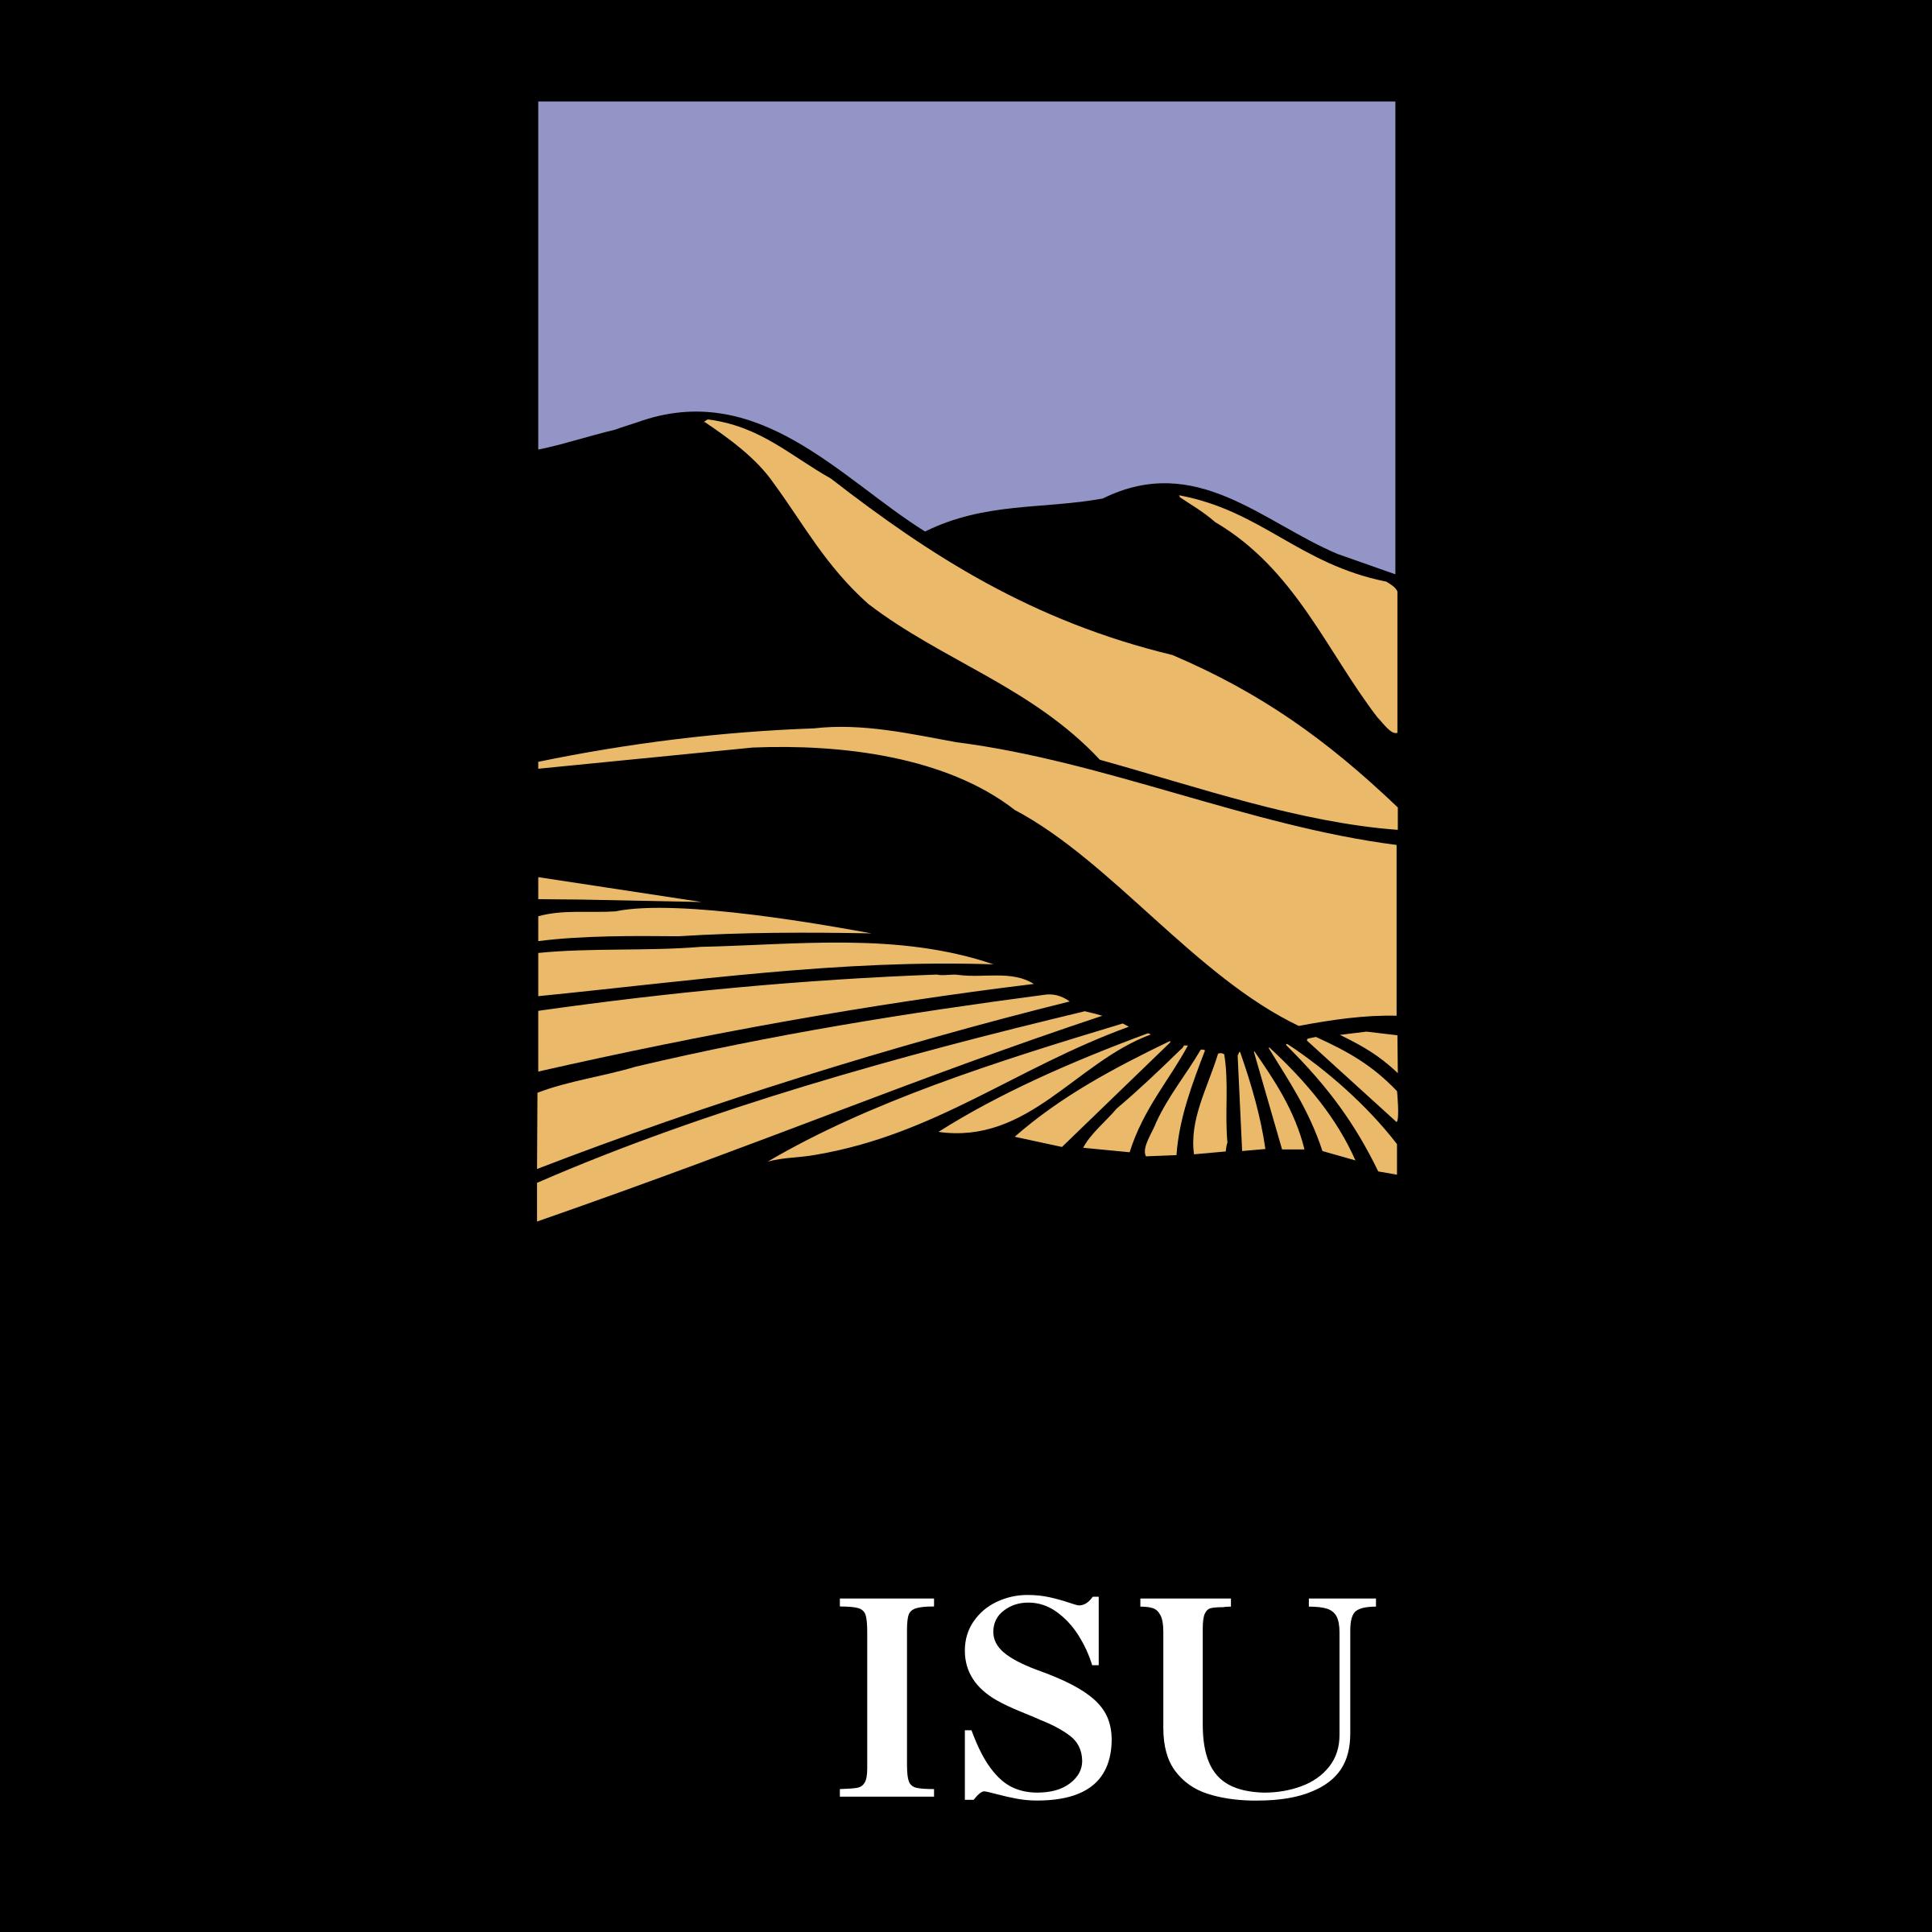 ISU Logo PNG Transparent & SVG Vector - Freebie Supply